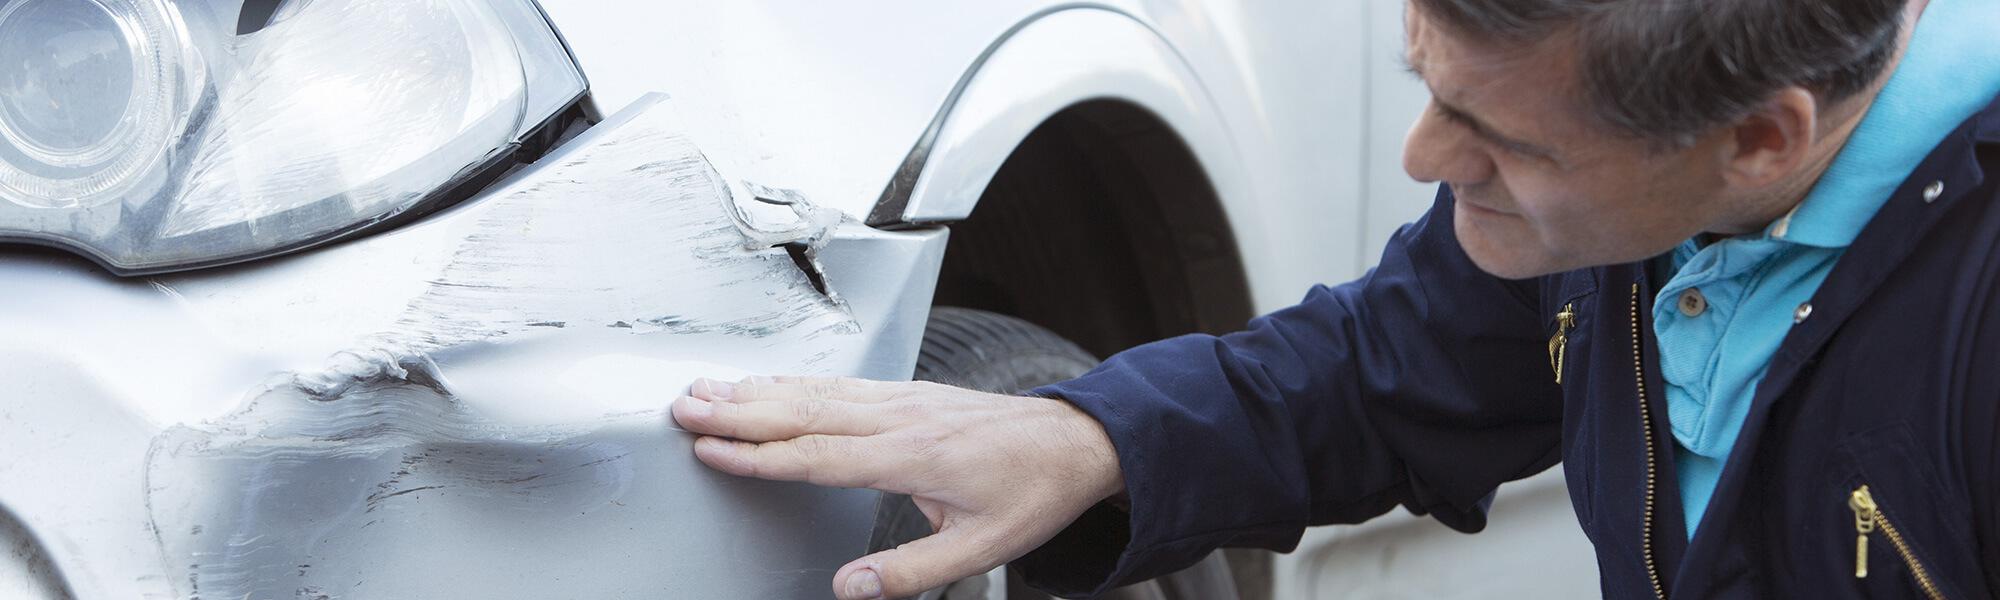 autohaus-ulmen-unfallservice